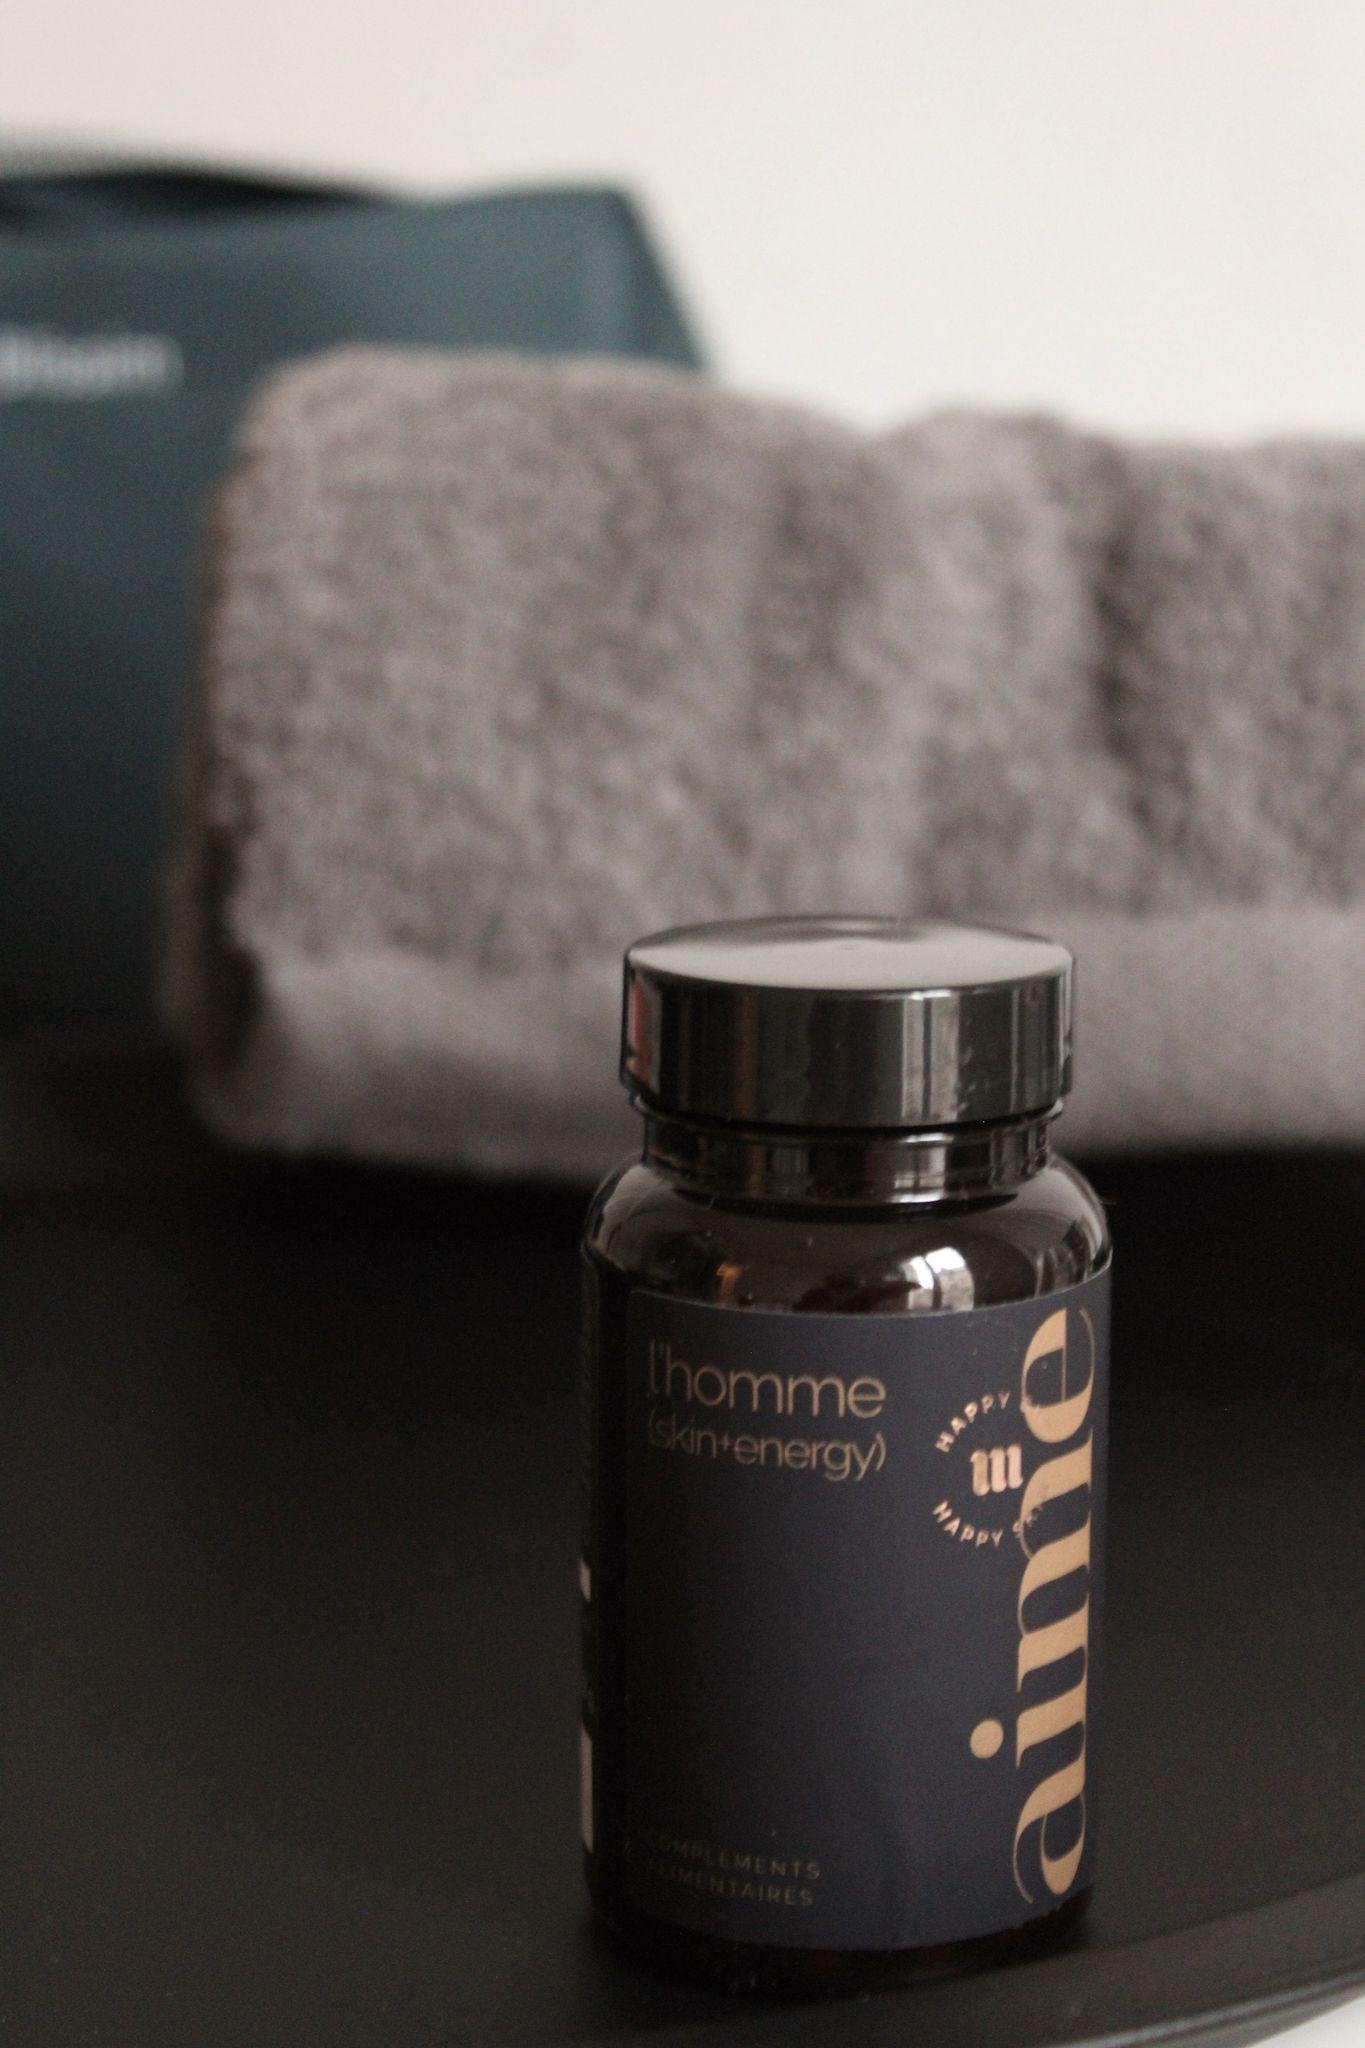 compléments alimentaires L'homme skin+energy Aime Skincare